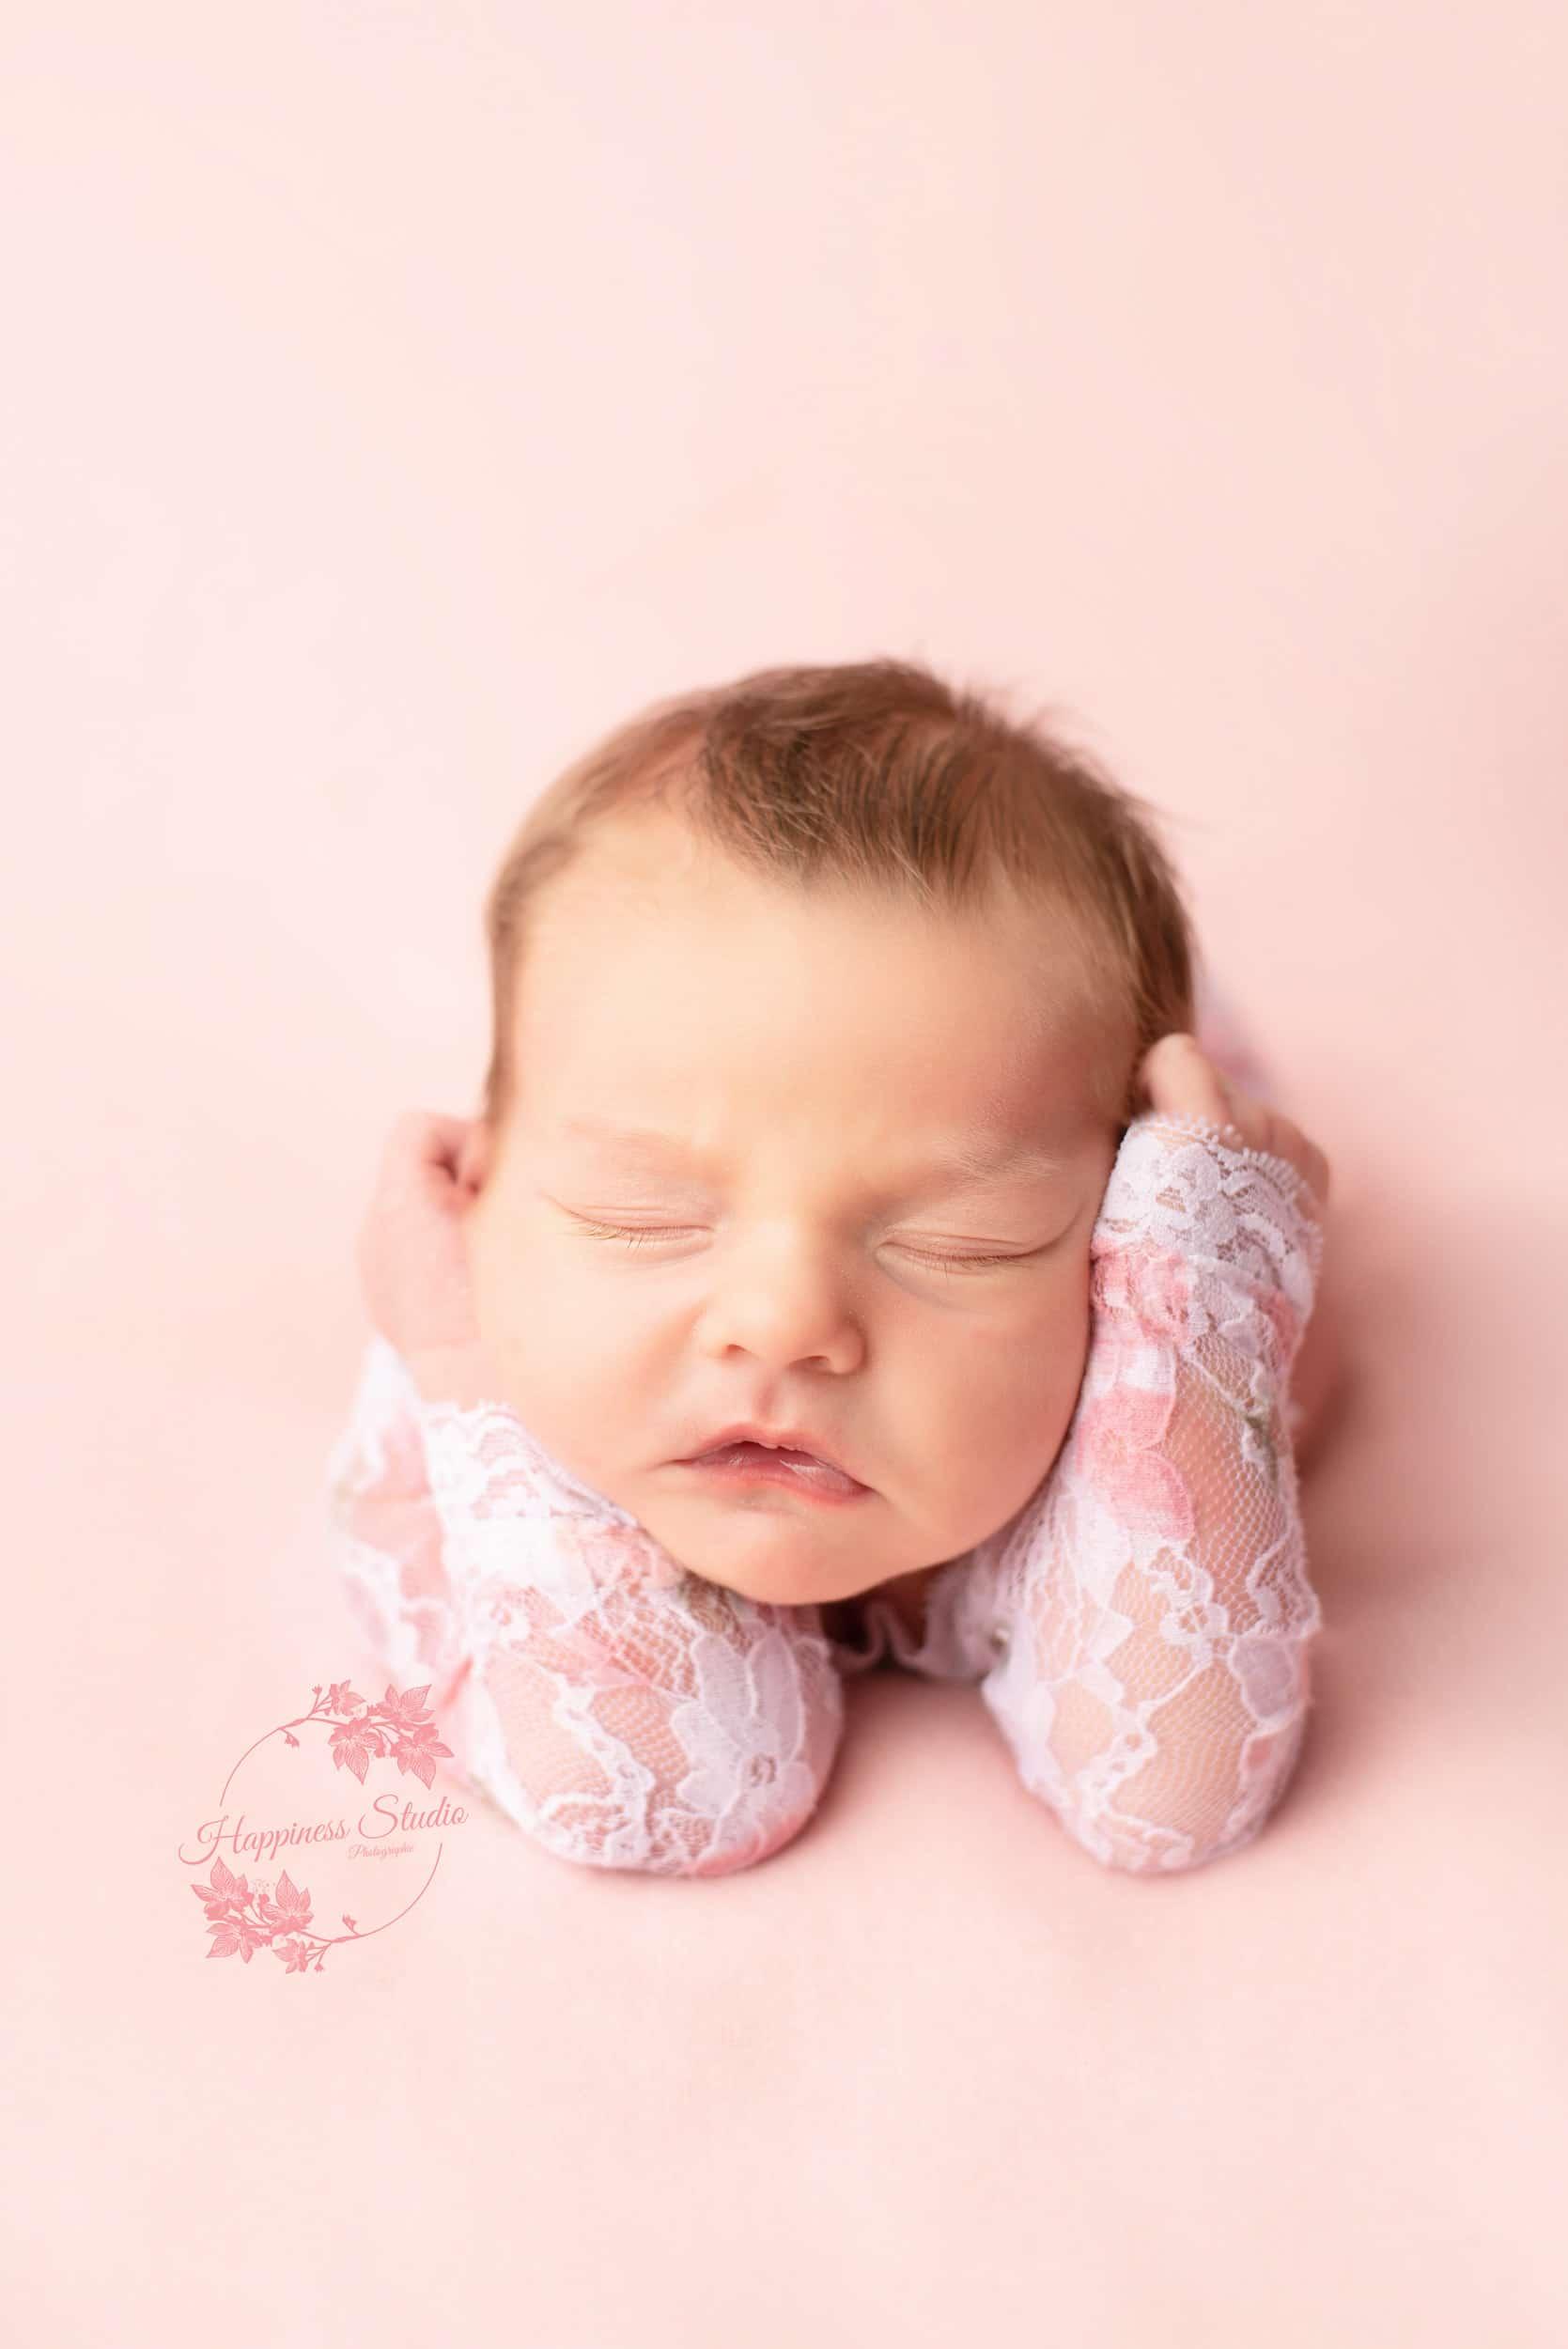 photographe de naissance lyon